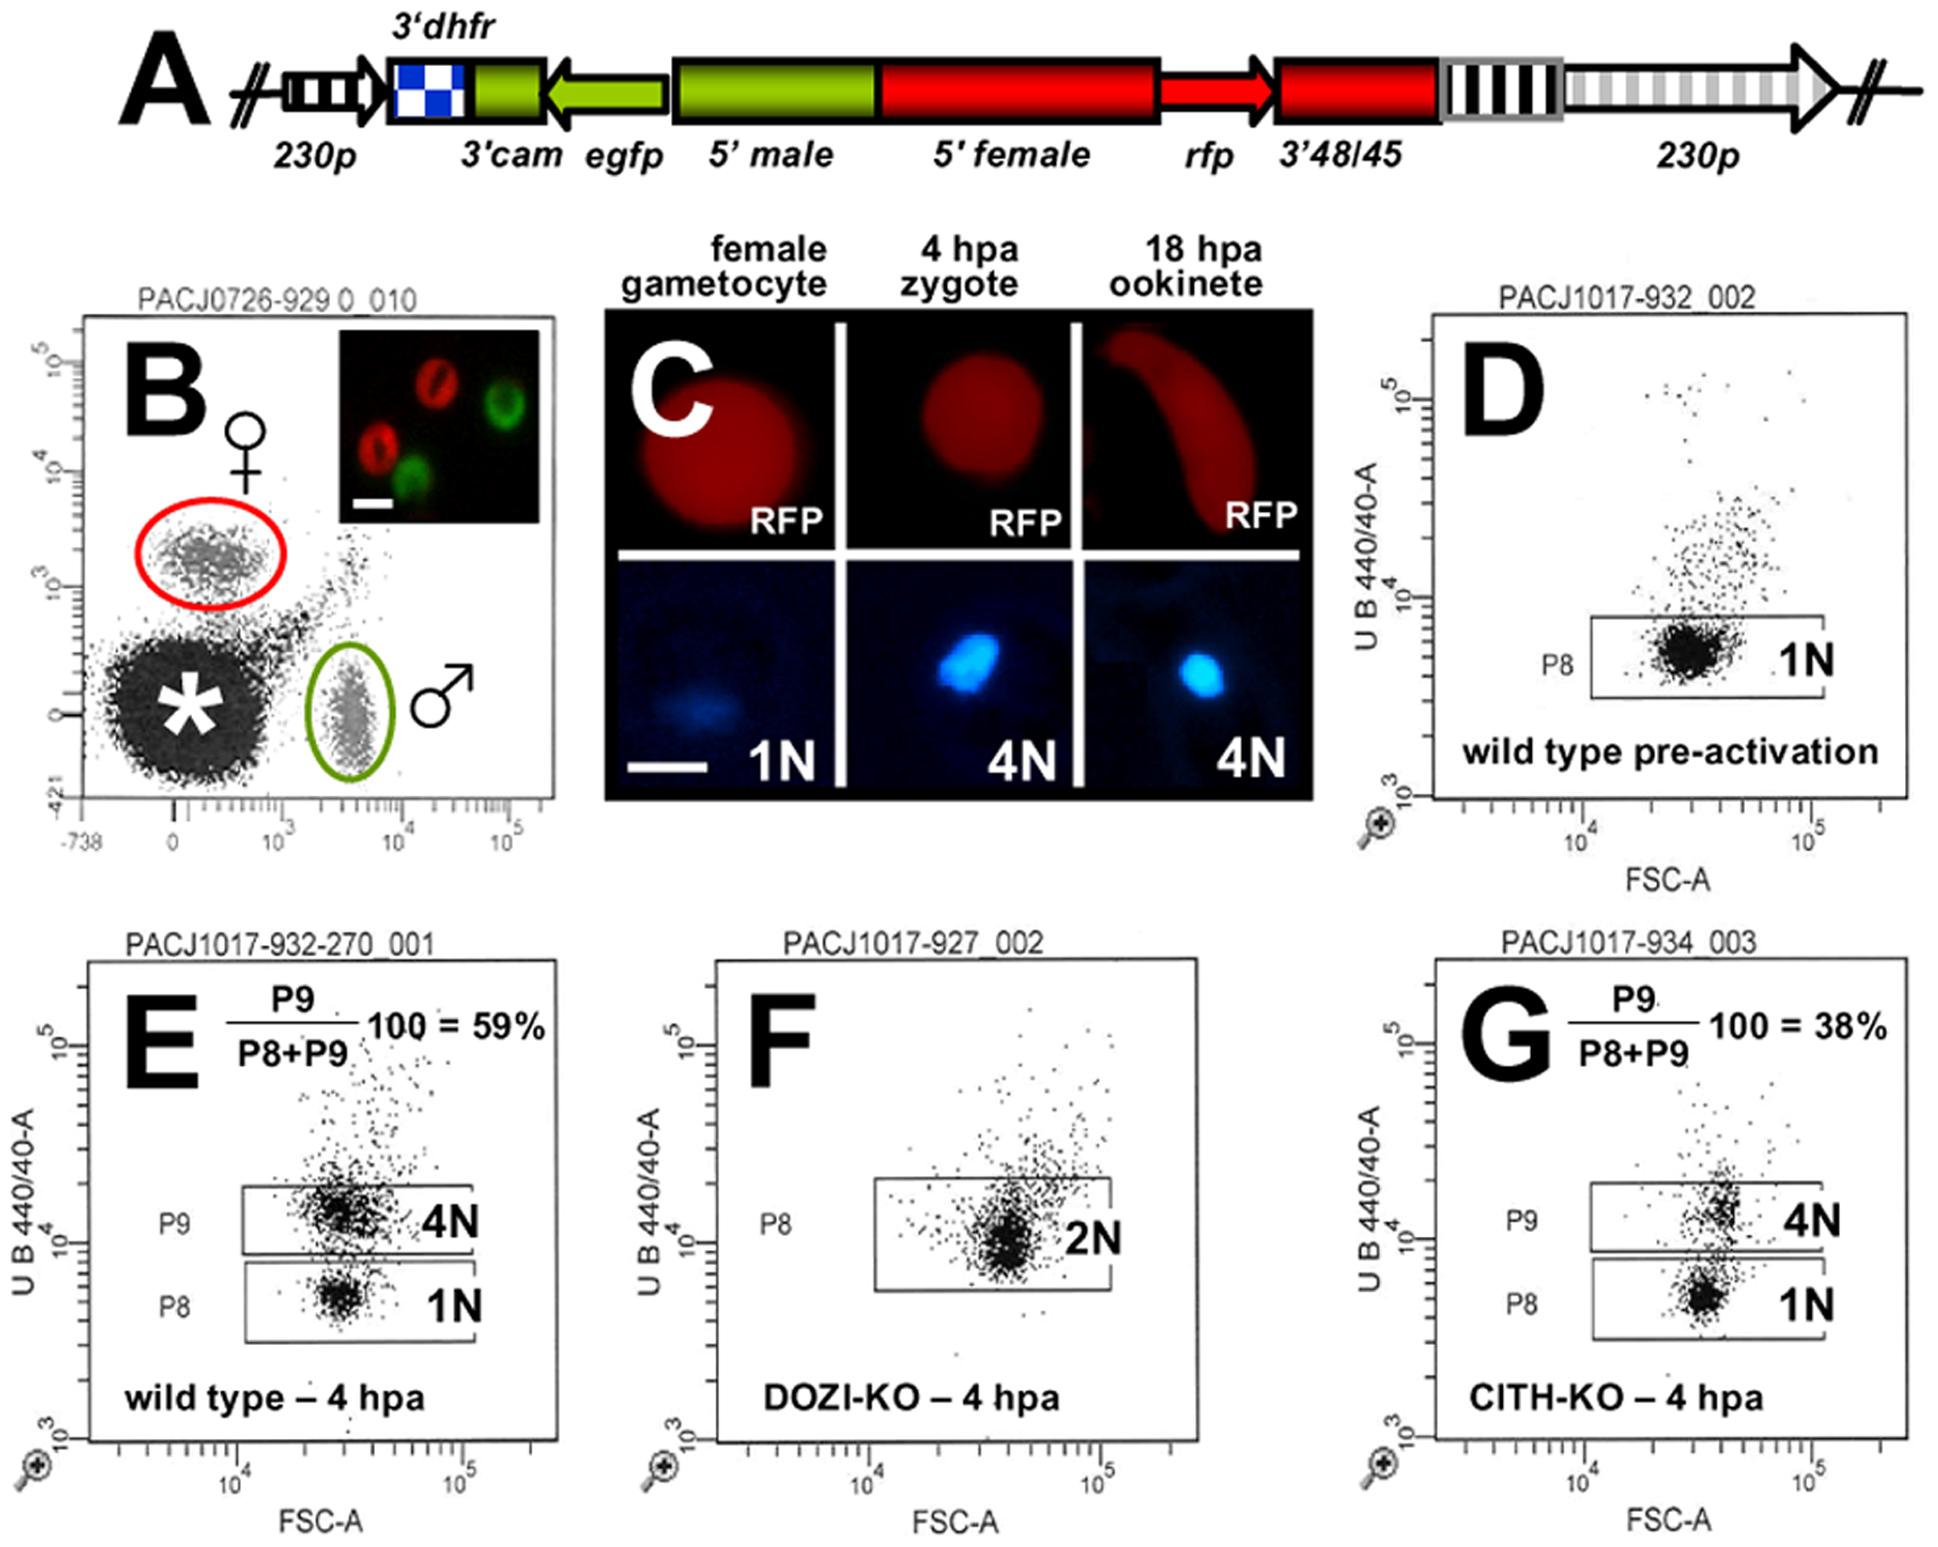 Zygotes formed by Δ<i>pbcith</i> and Δ<i>pbdozi</i> gene deletion mutants abort zygote to ookinete transformation.